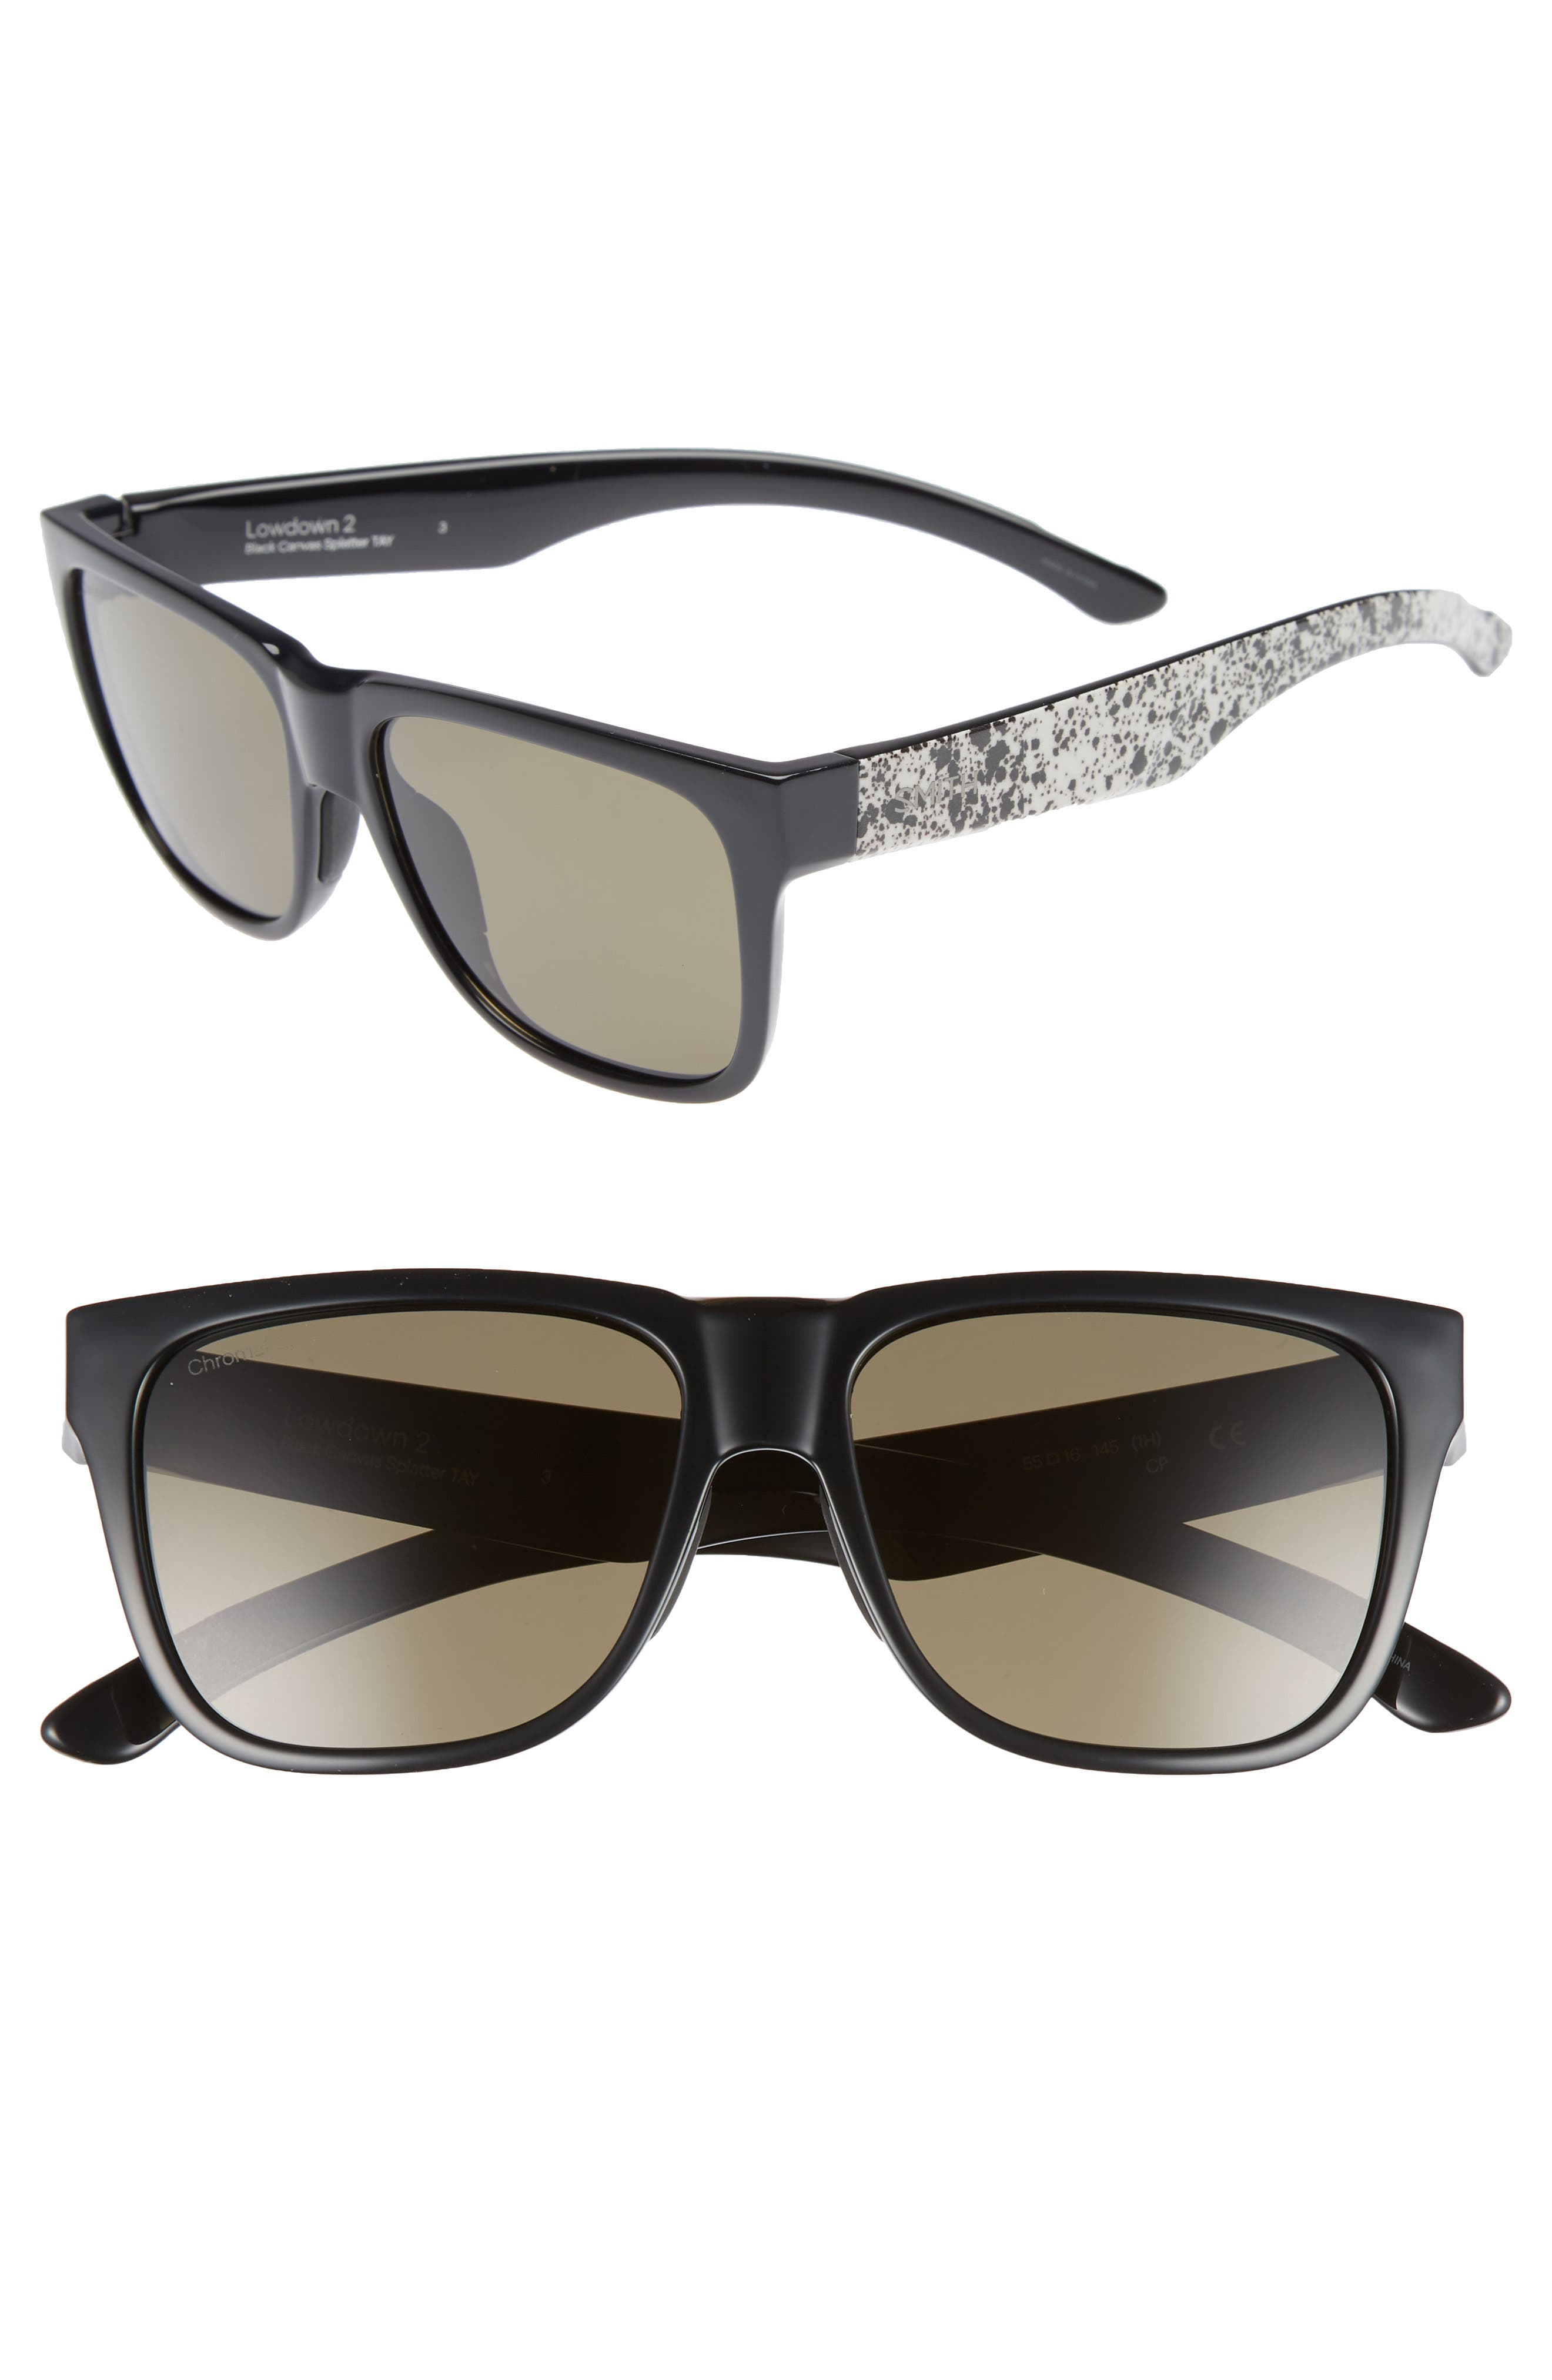 Smith Outlier 2 57mm ChromaPop™ Sunglasses